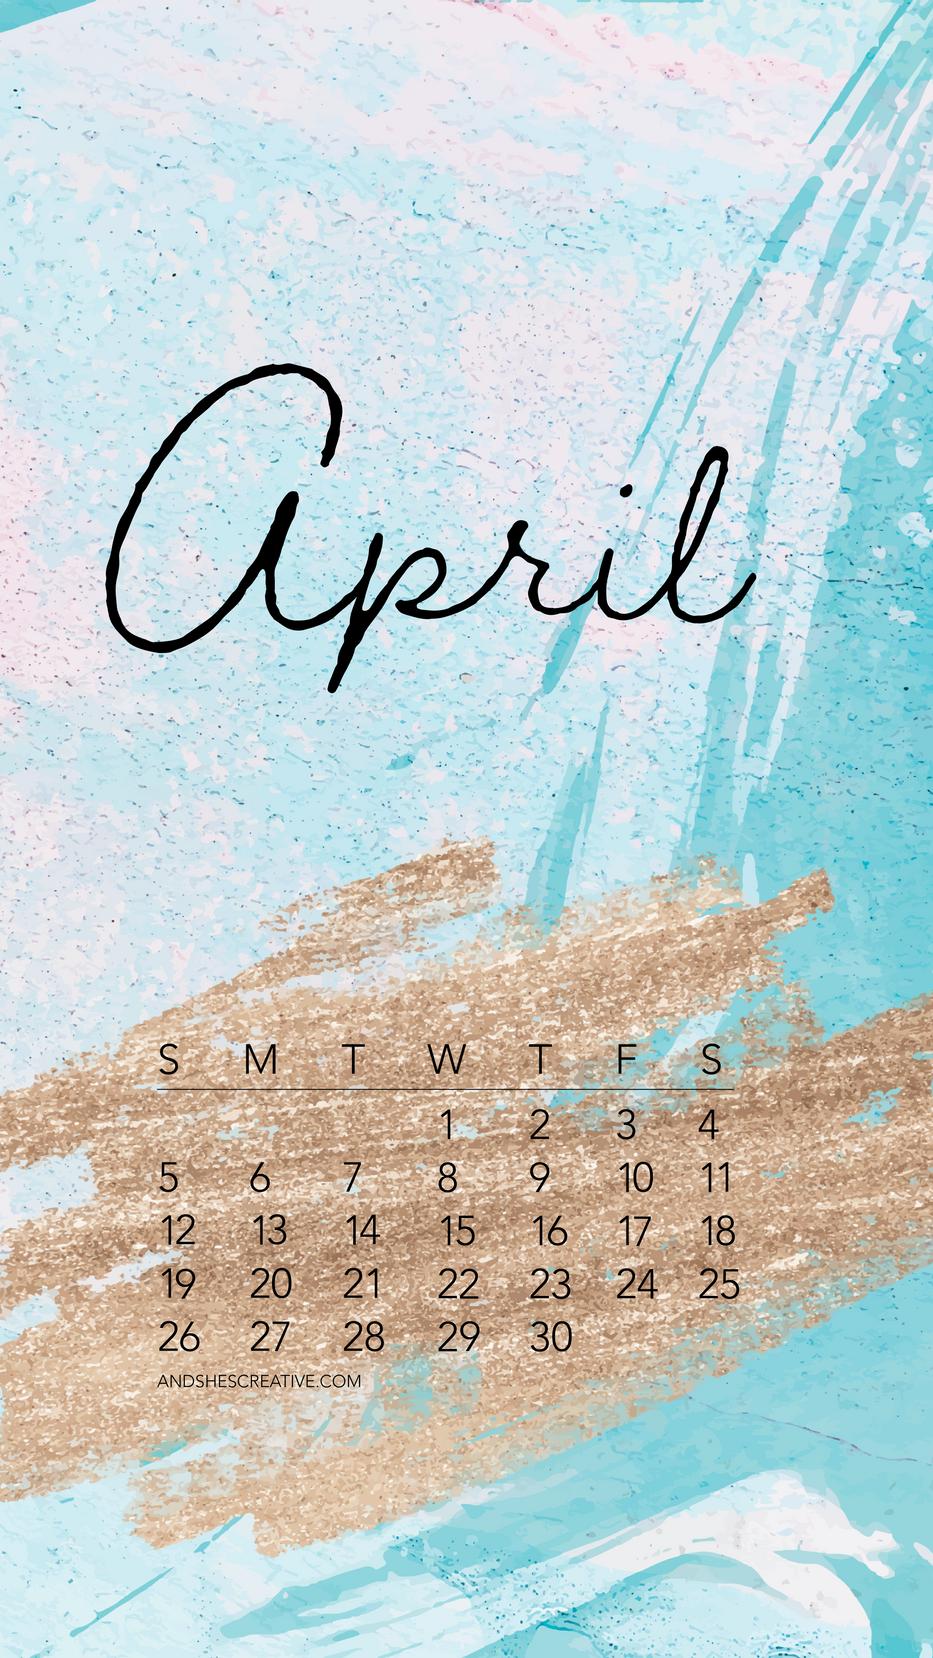 April 2020 Glitter Background Mobile